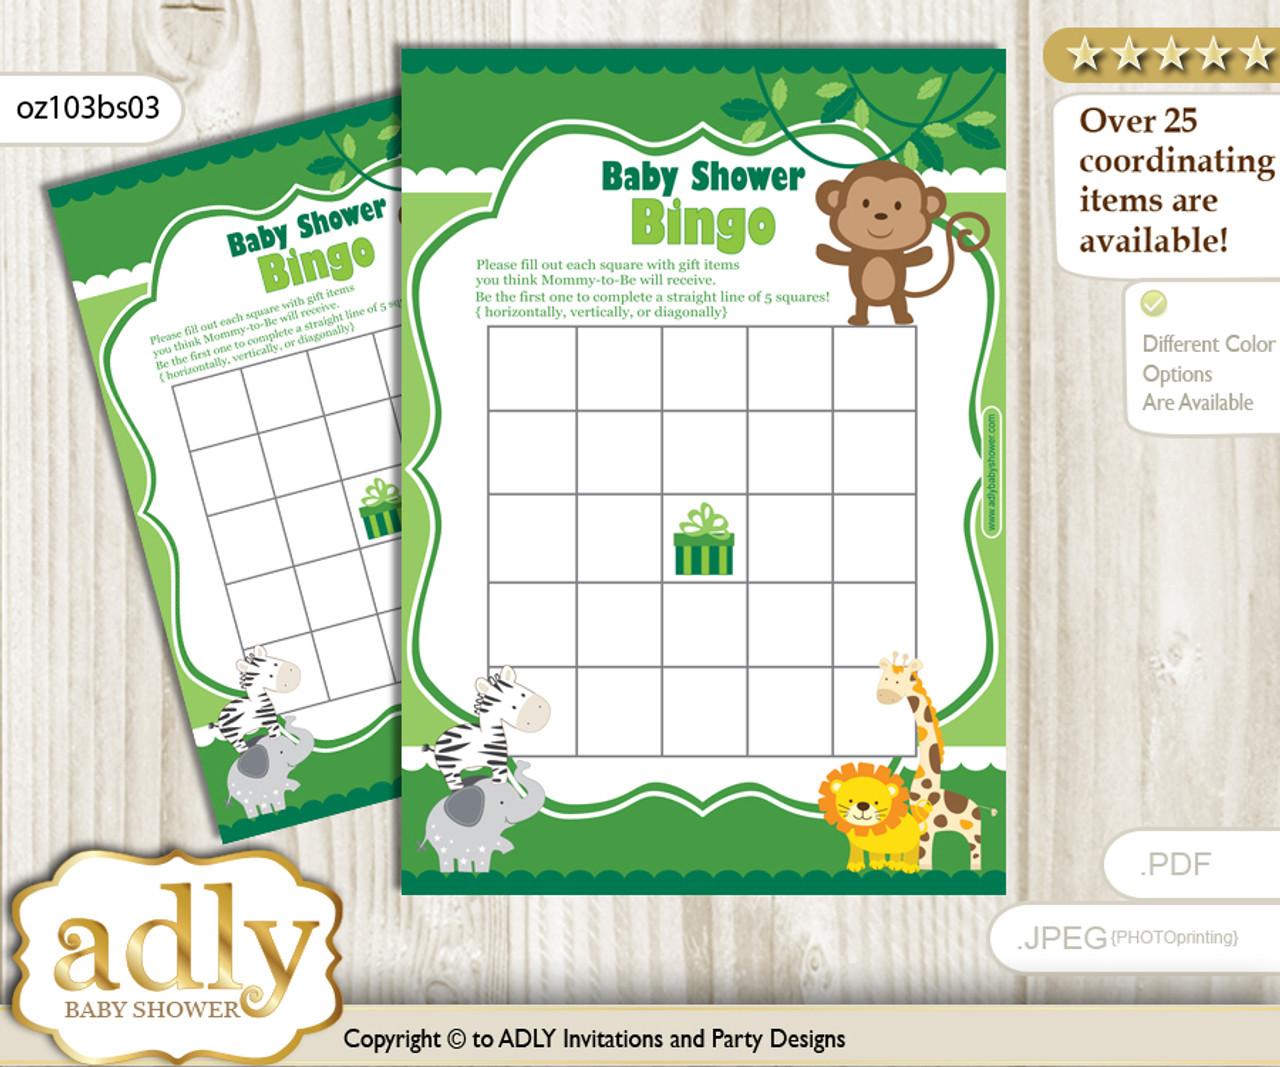 photograph regarding Animal Bingo Printable named Printable environmentally friendly Jungle Bingo Video game Printable Card for Child Boy Shower Do it yourself gray, eco-friendly, Pets